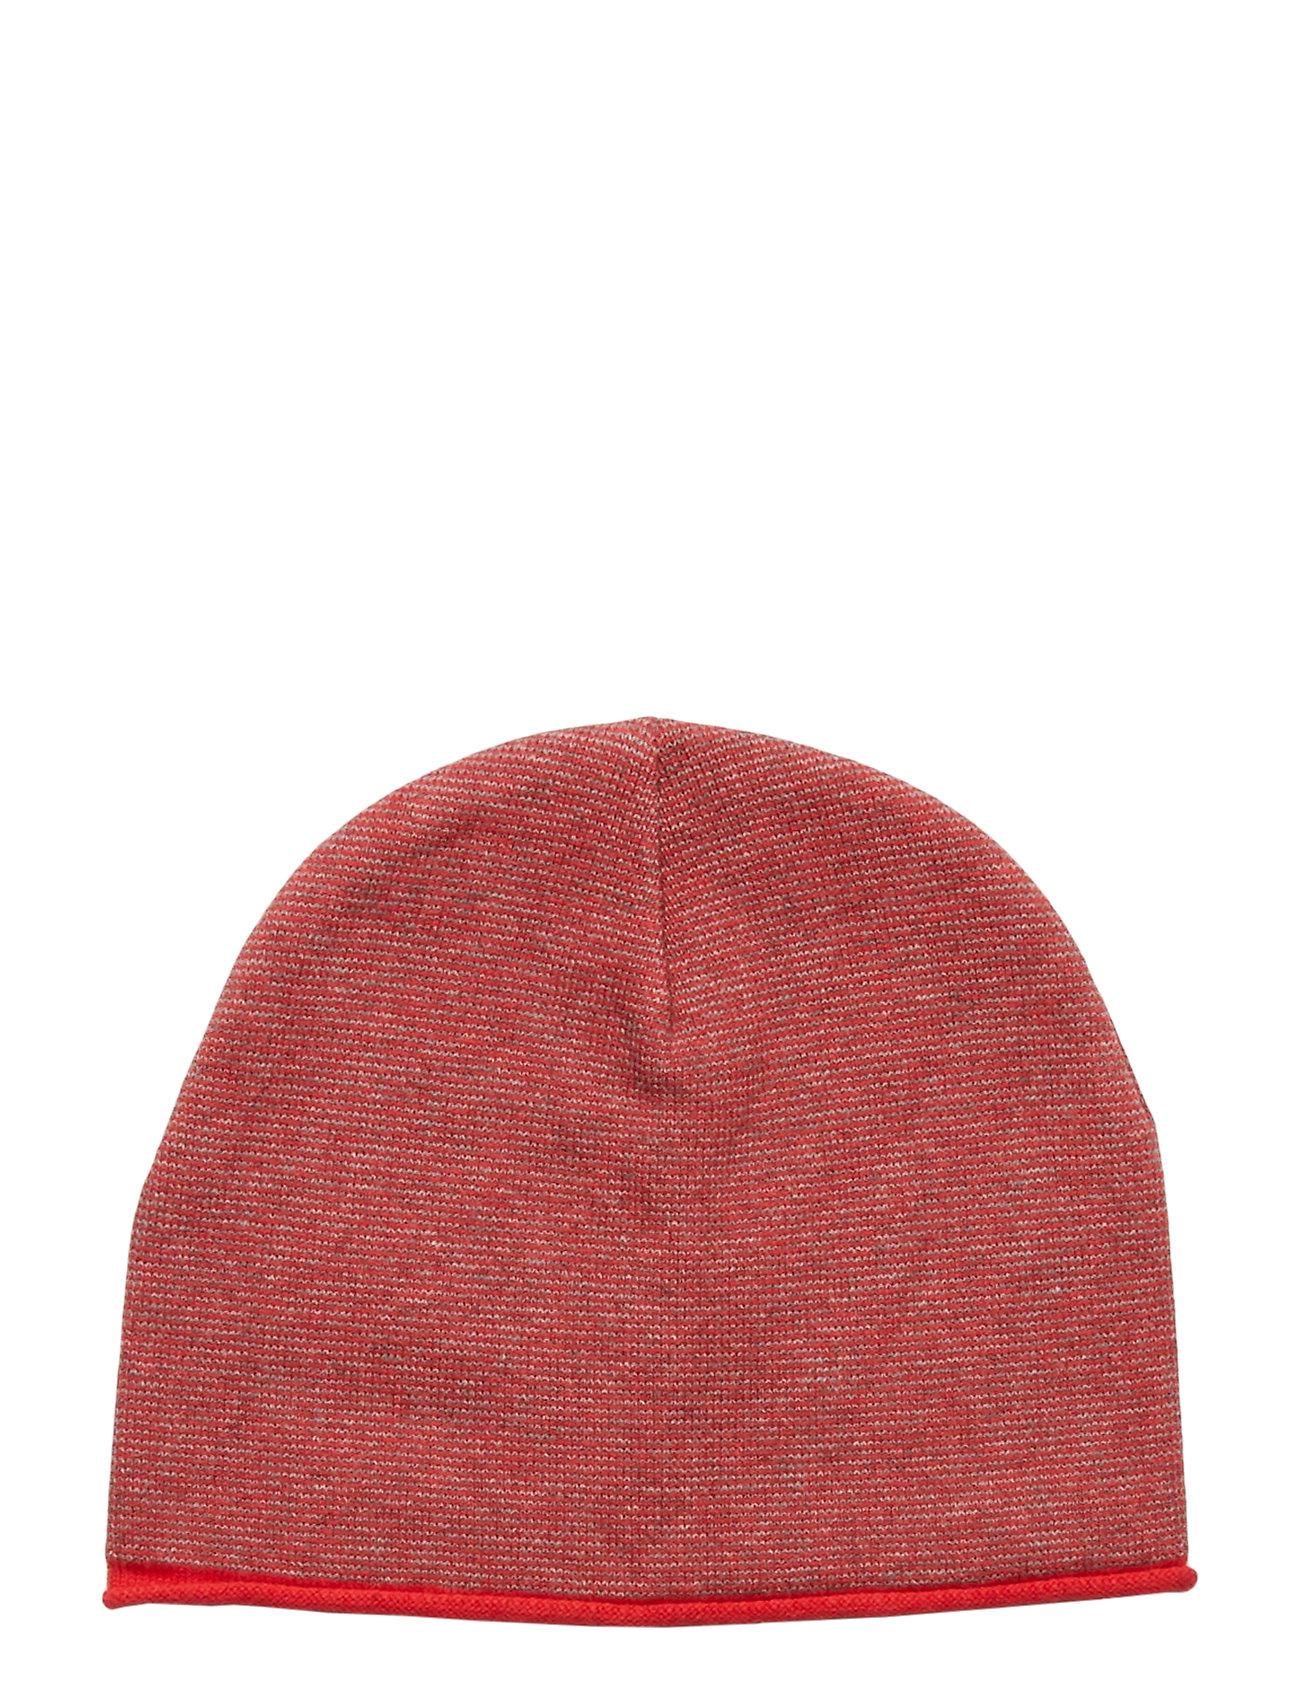 Polarn O. Pyret Cap Solid Preschool - RIBBON RED